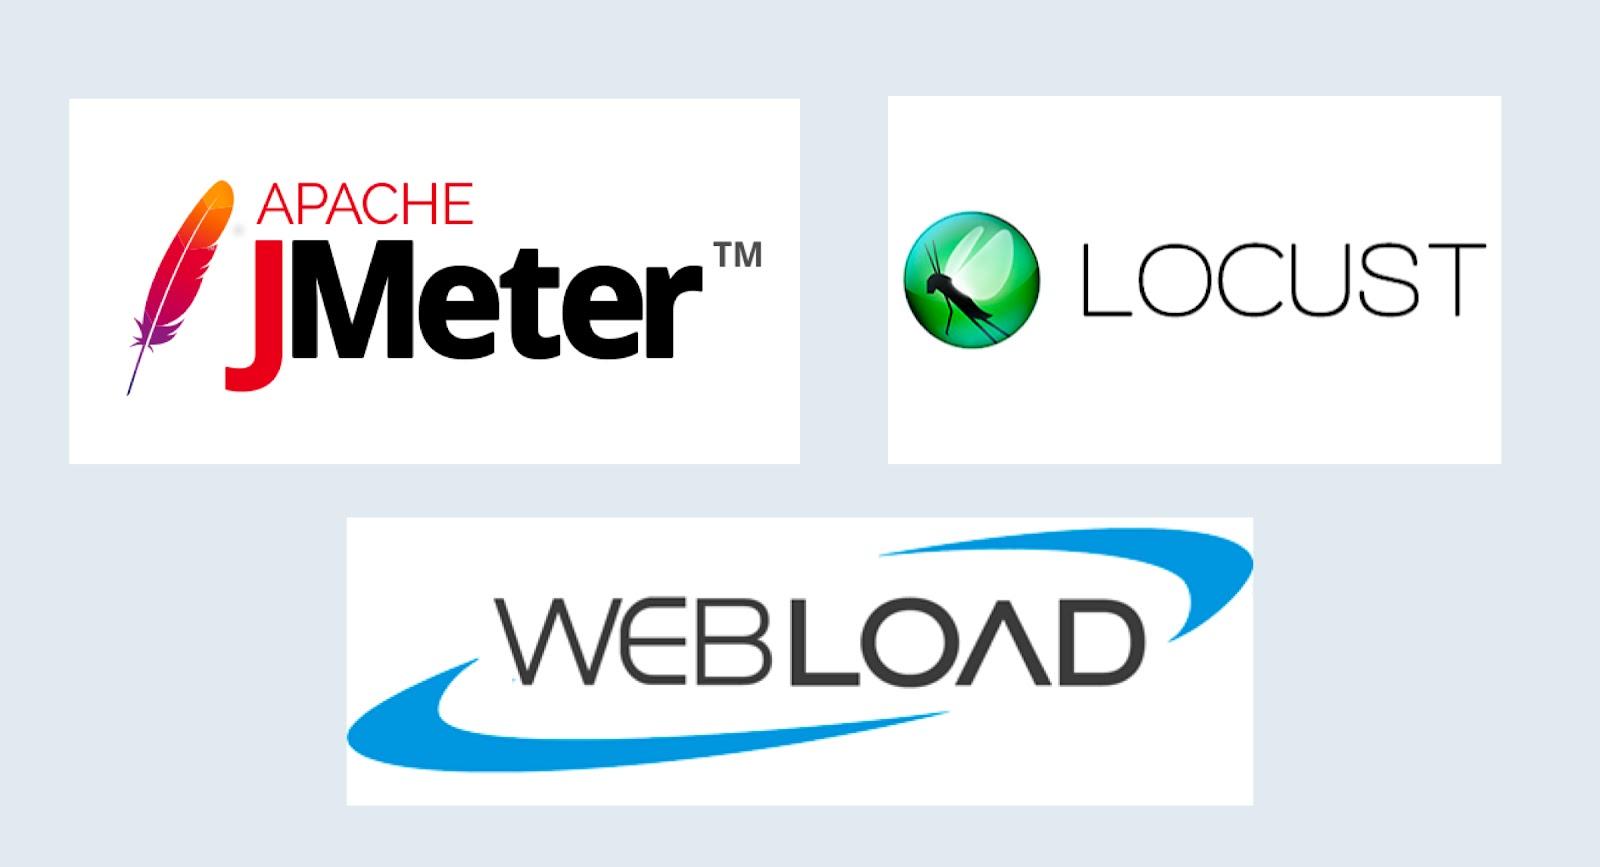 jmeter-locust-webload-performance-testing-tools